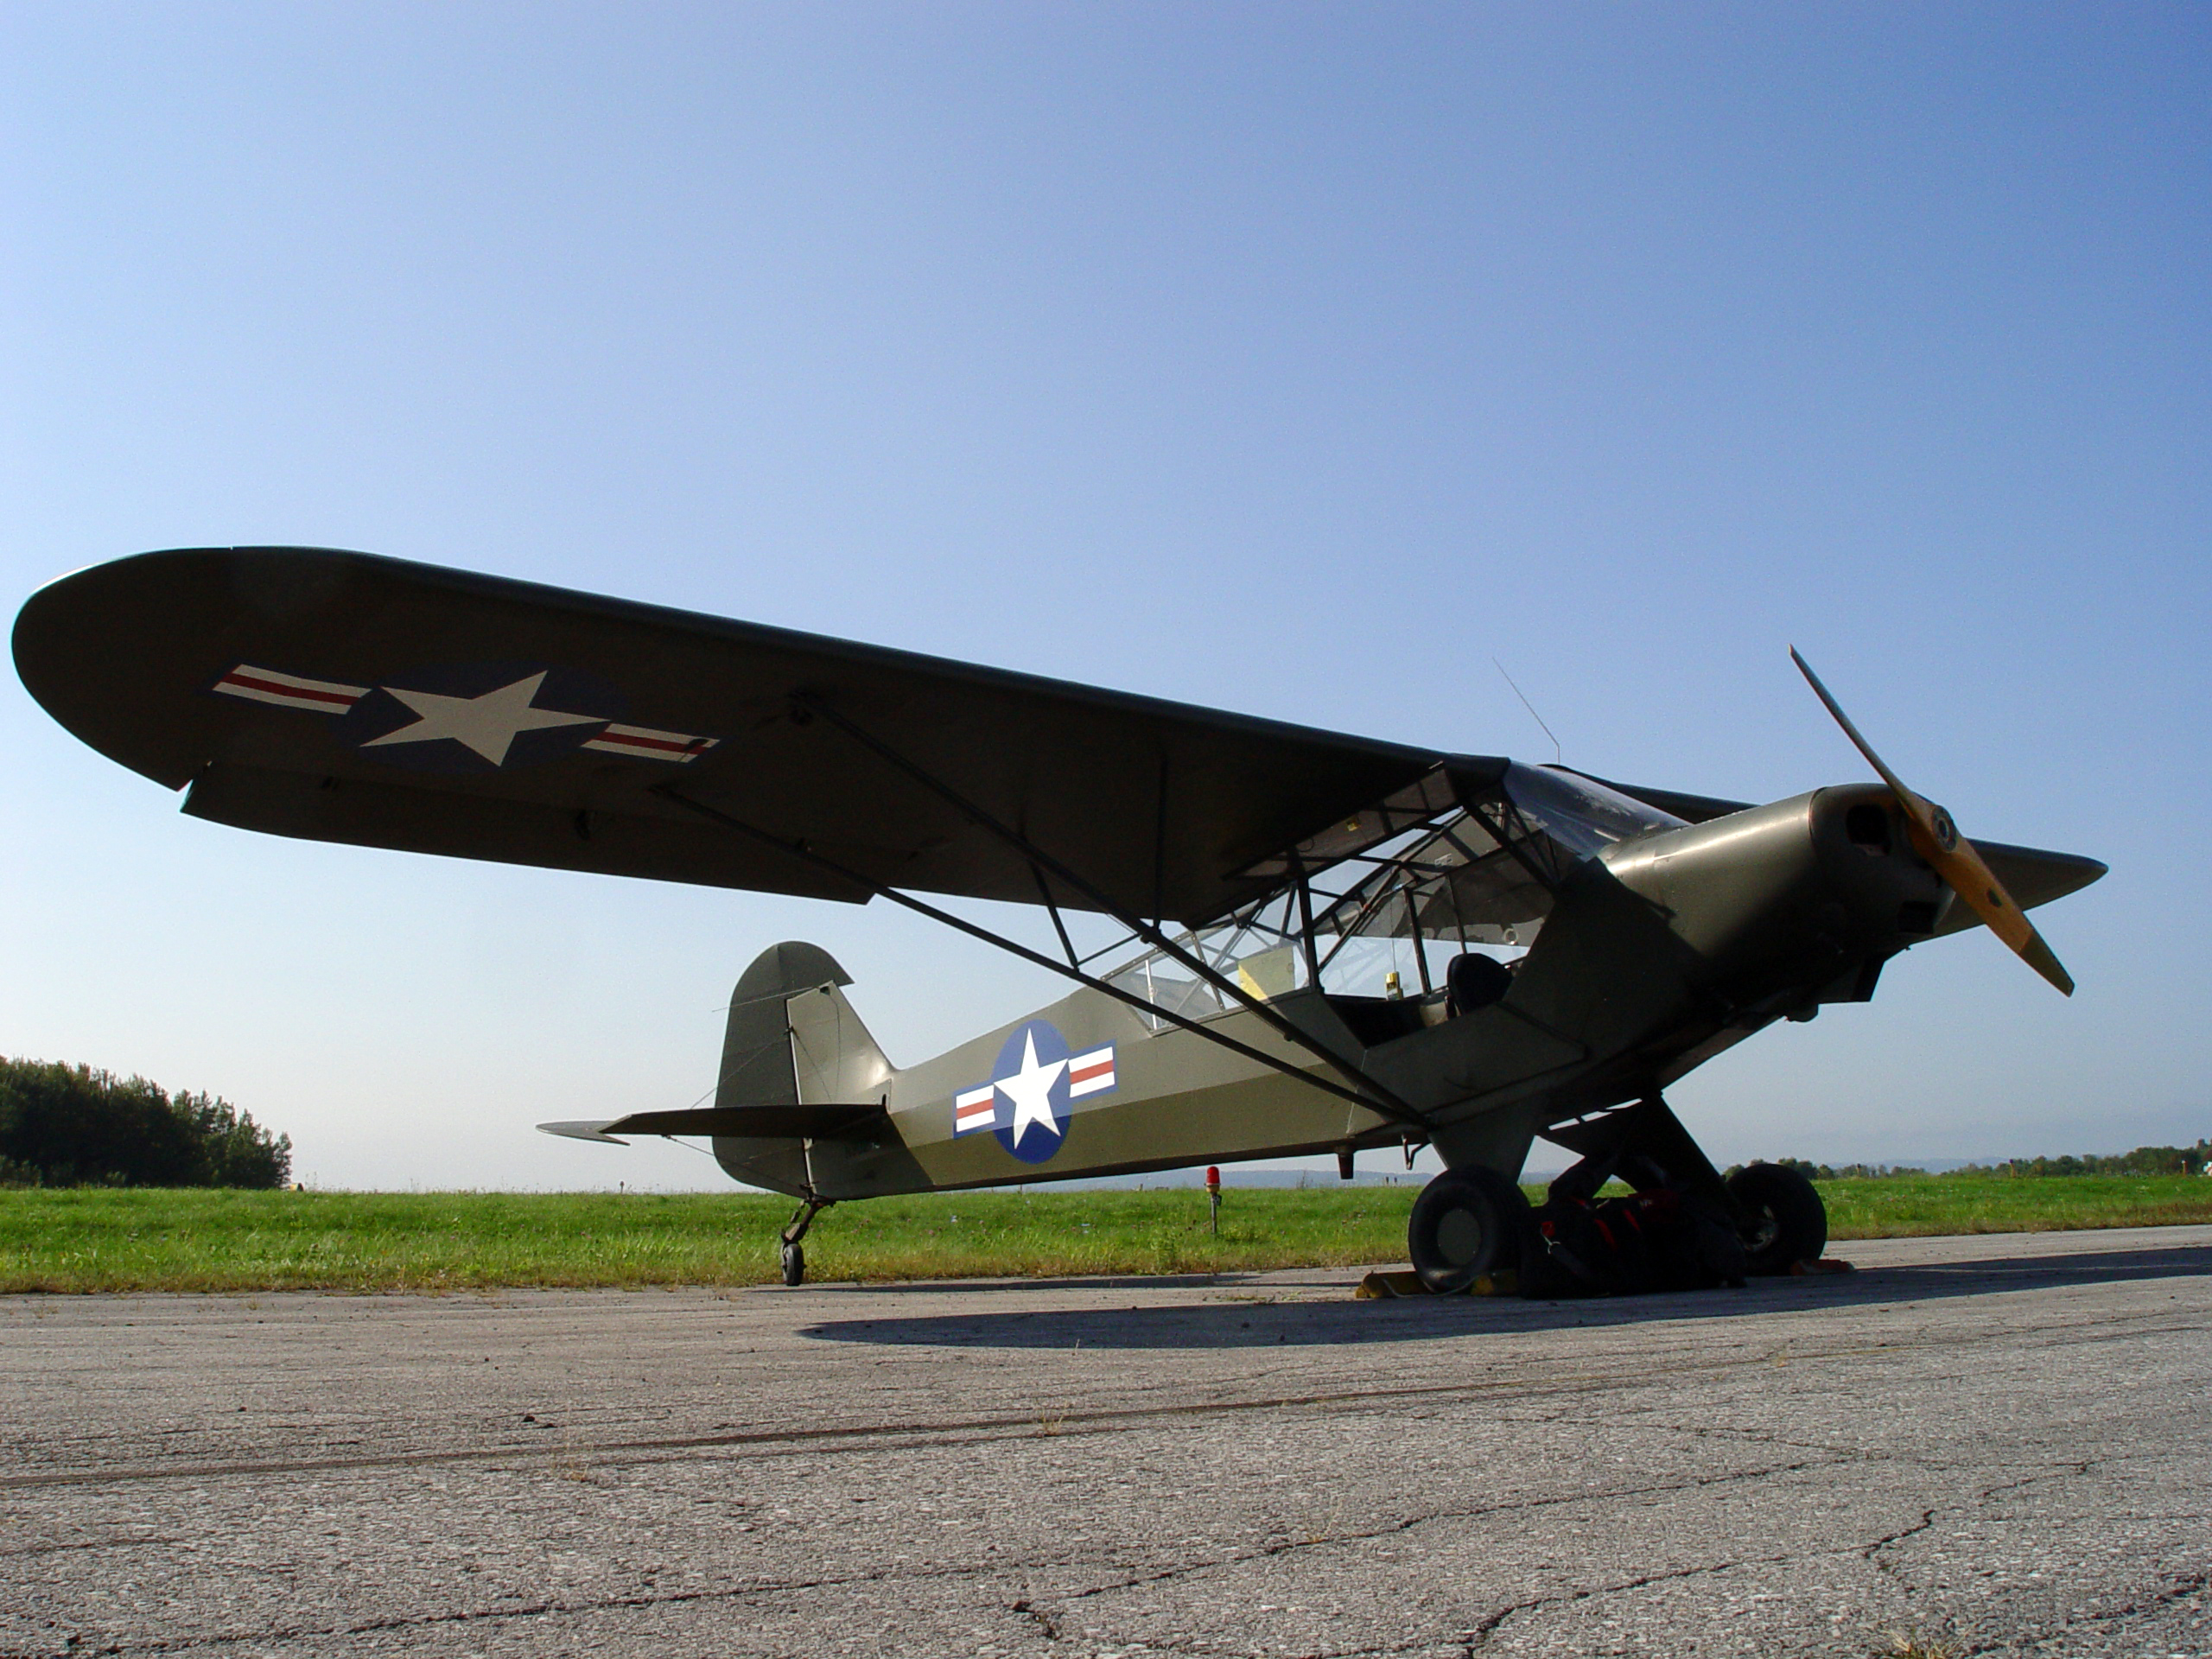 Modern Experimental Airplanes